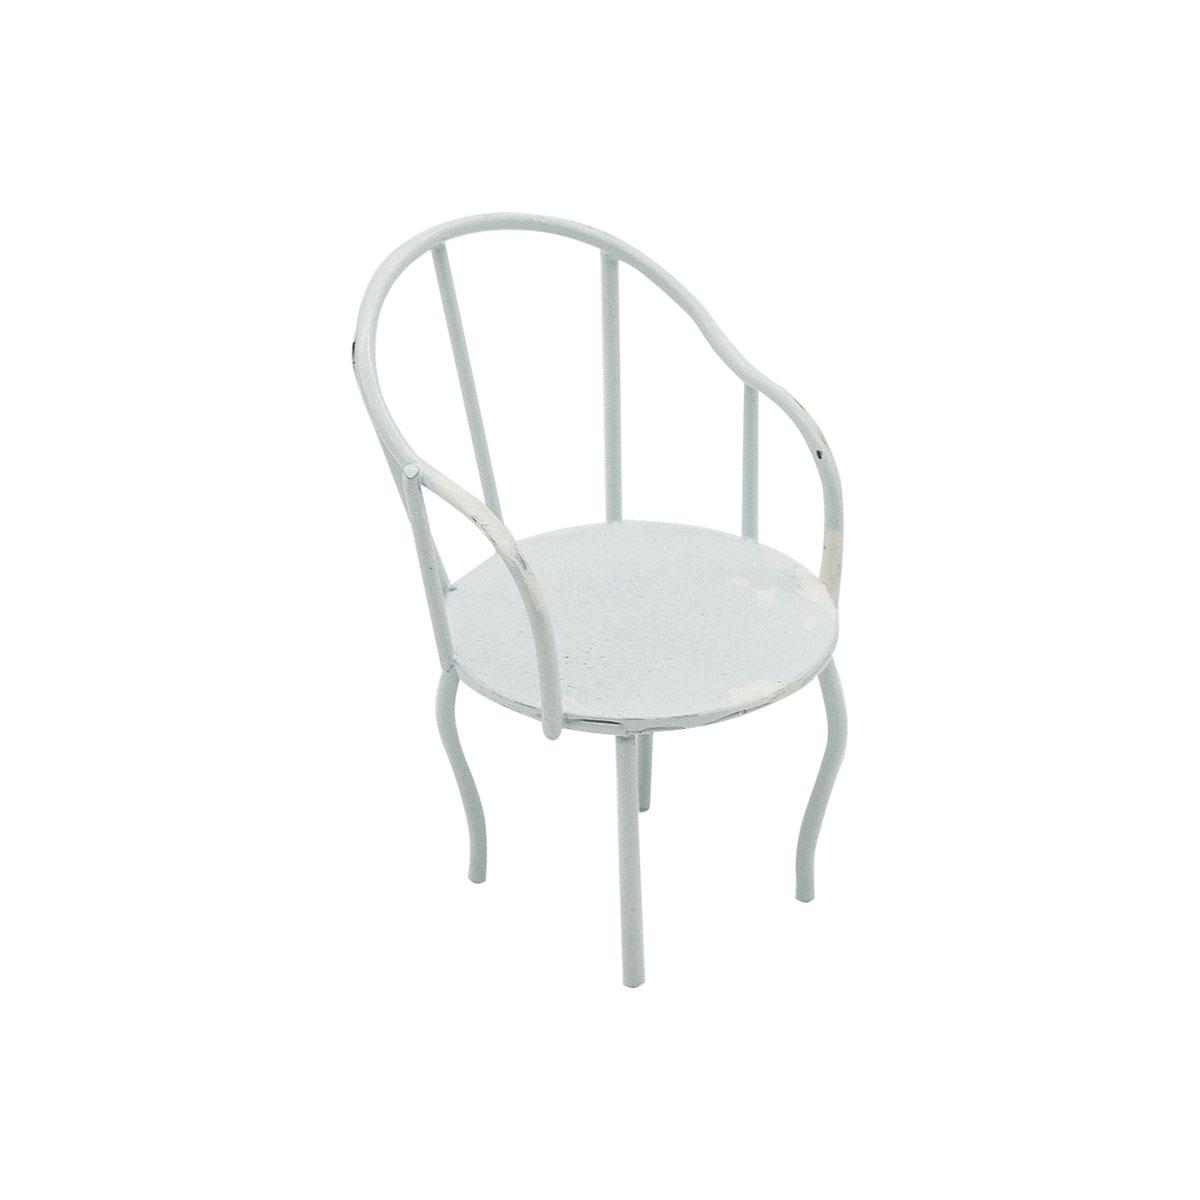 KB2555A Металлический мини стул, белый 4*3*6,5см Астра